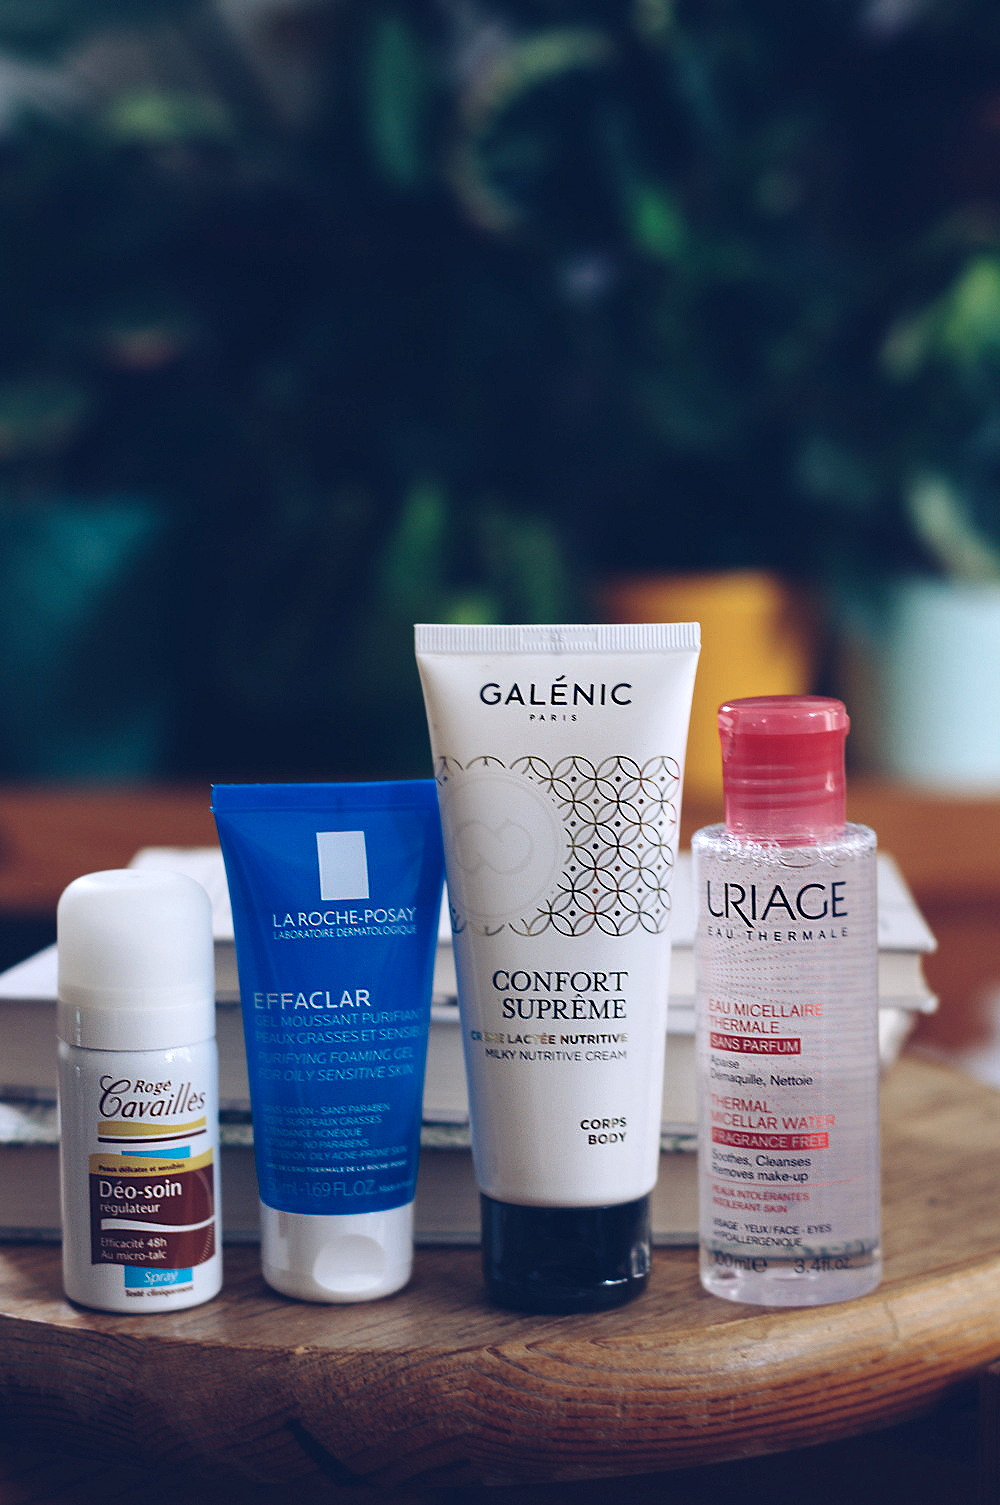 Newpharma Roge Cavailles Dermato Deo-Pflege-Spray La Roche-Posay Effaclar Uriage Mizellarwasser Galenic Confort Supreme